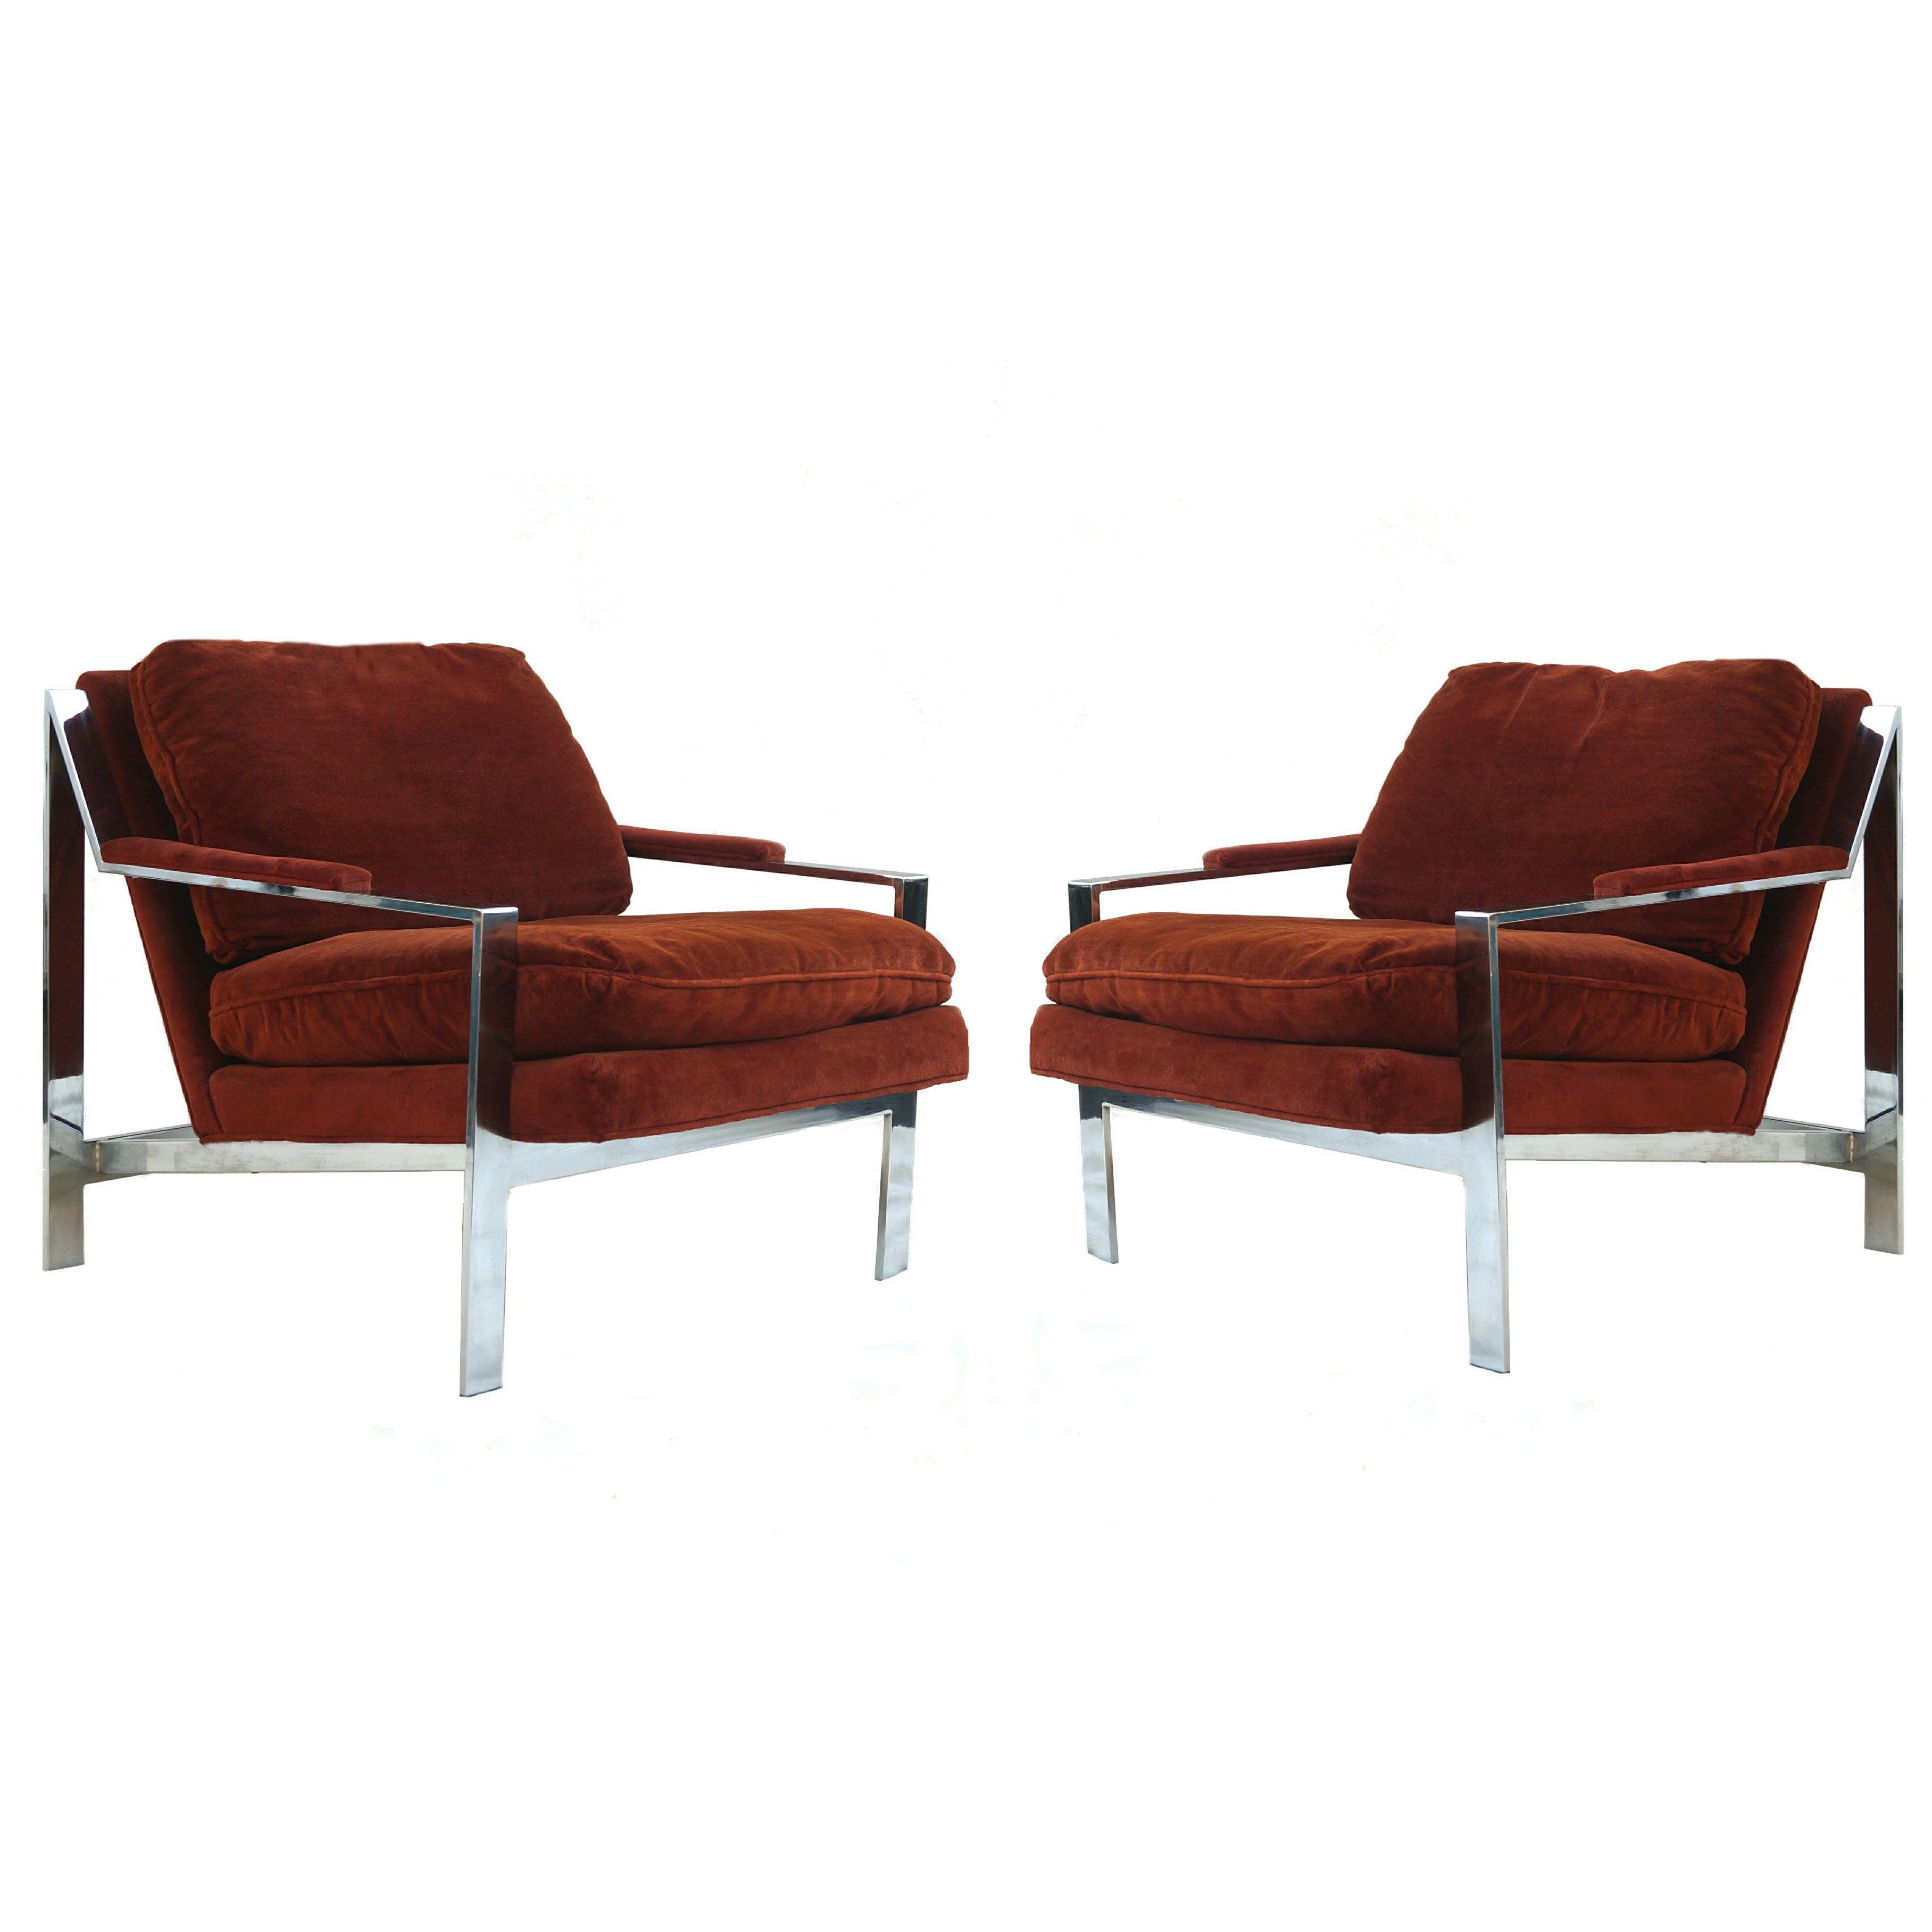 Pair of Cy Mann Mid-Century Modern Chrome Lounge Chairs